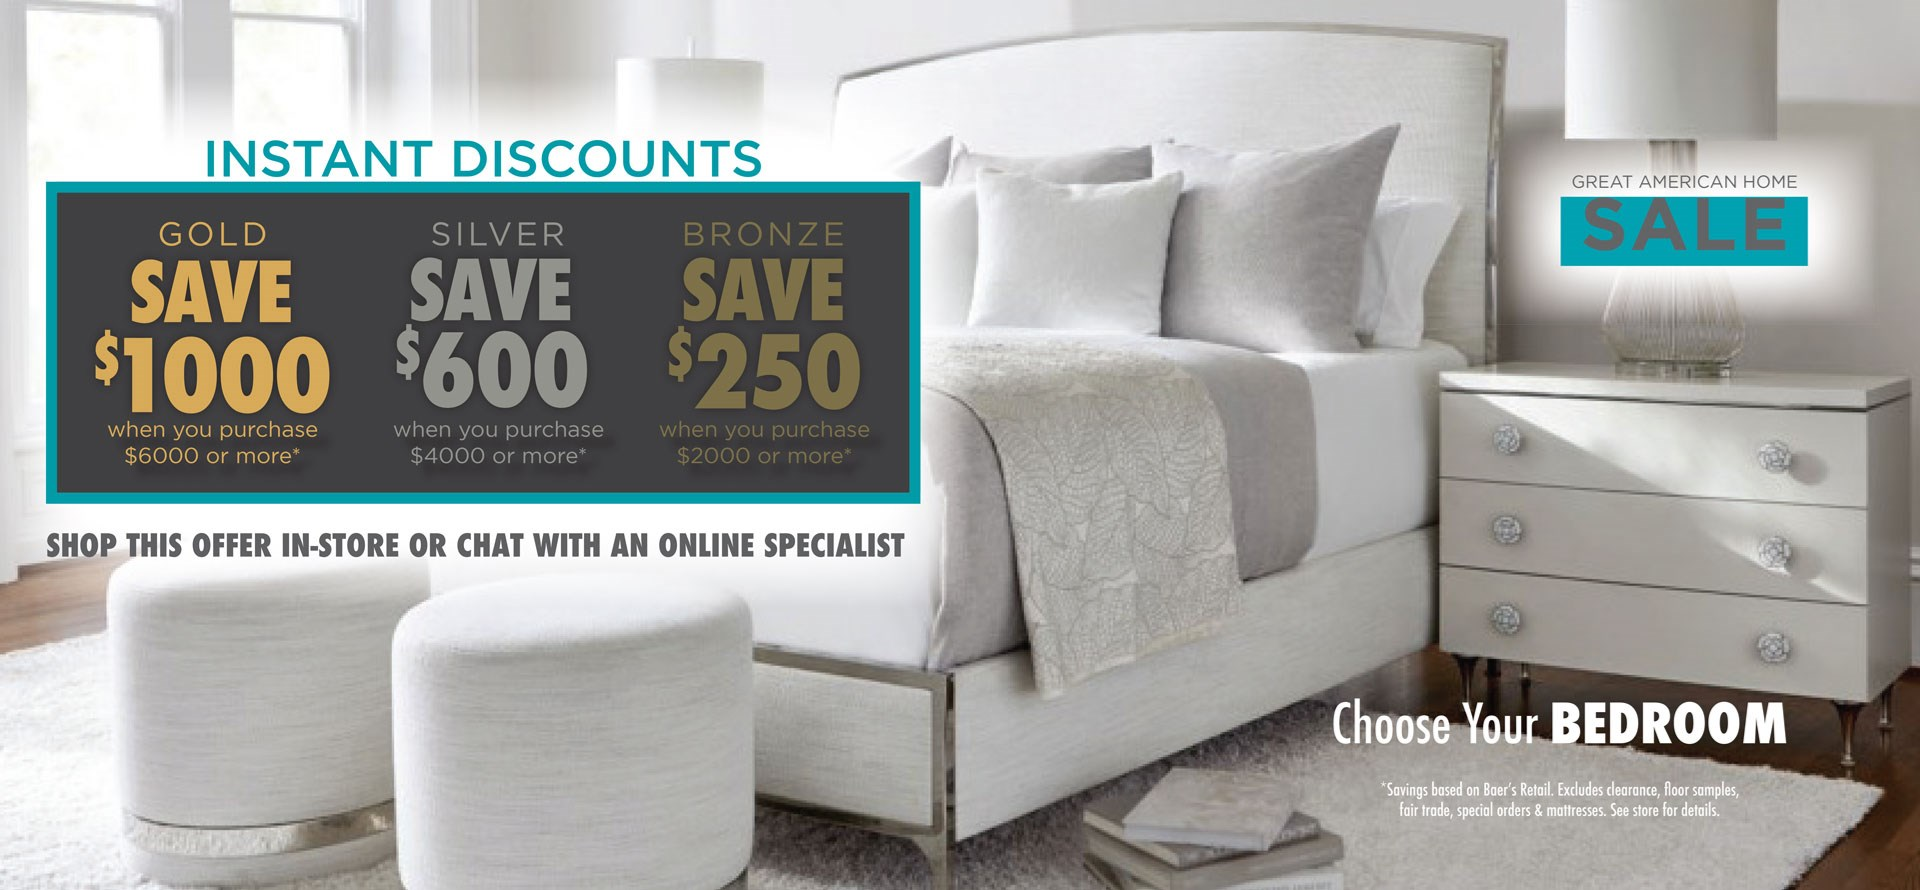 Great American Home Sale - Bedroom